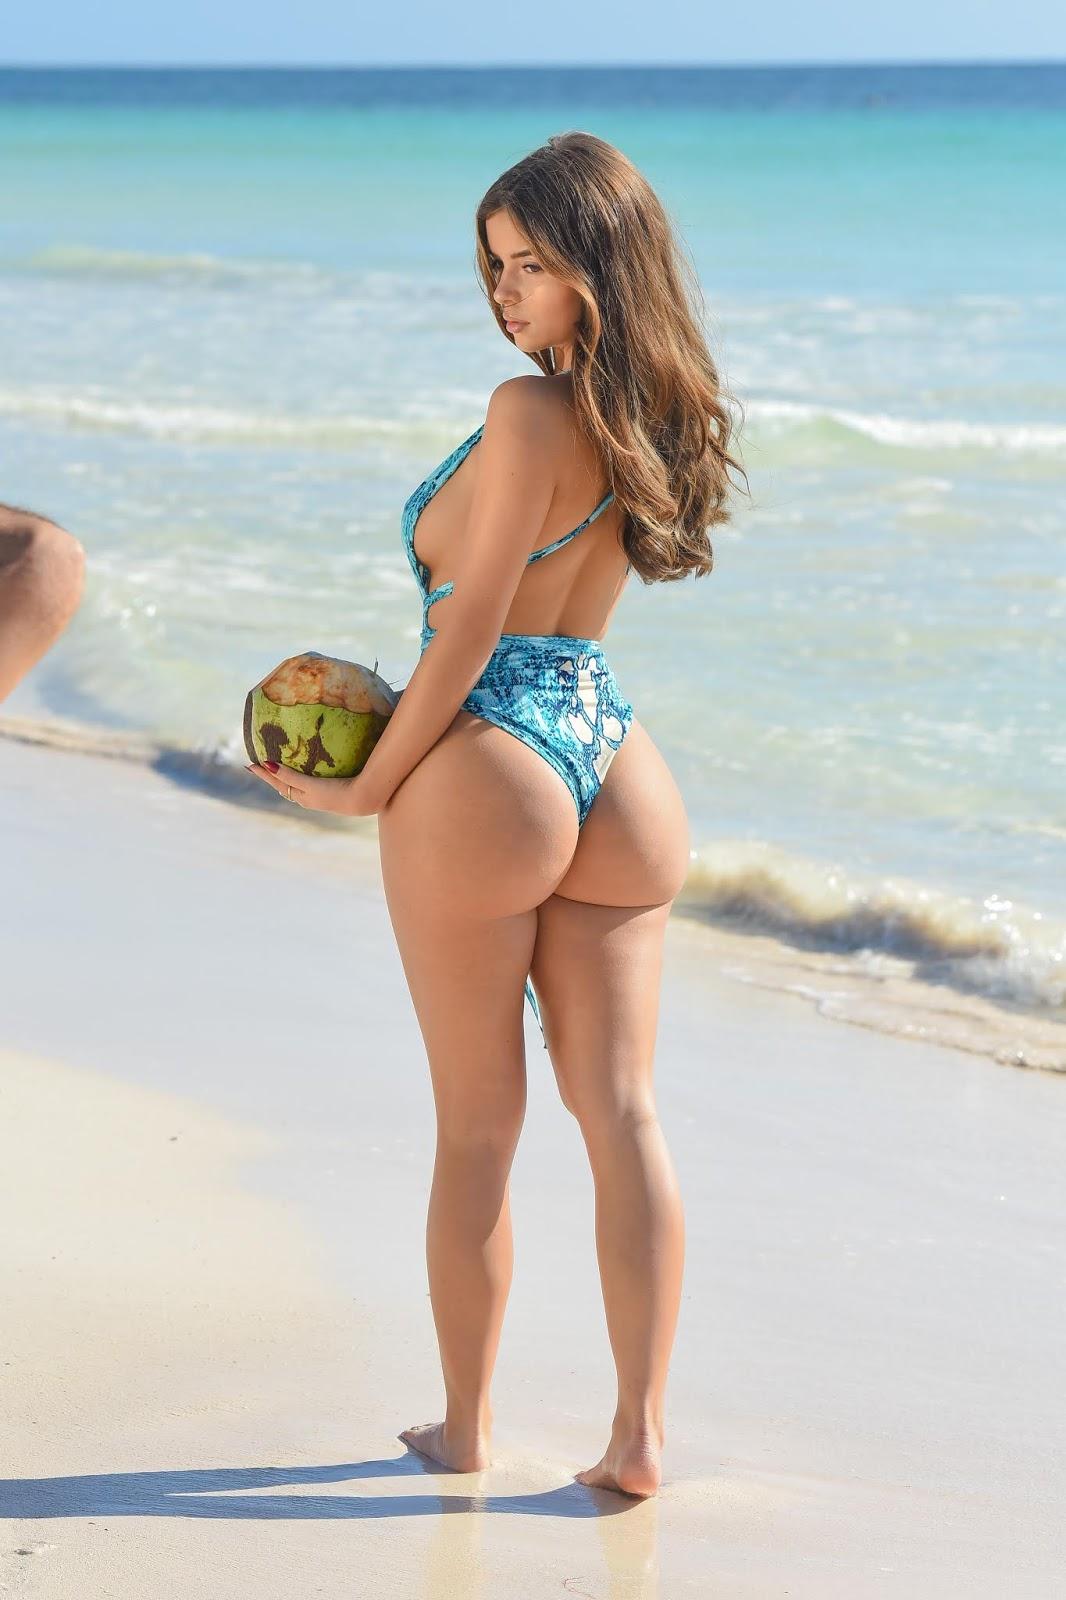 Demi Rose - Swimsuit photo shoot in Tulum Mexico - 01/11/2019